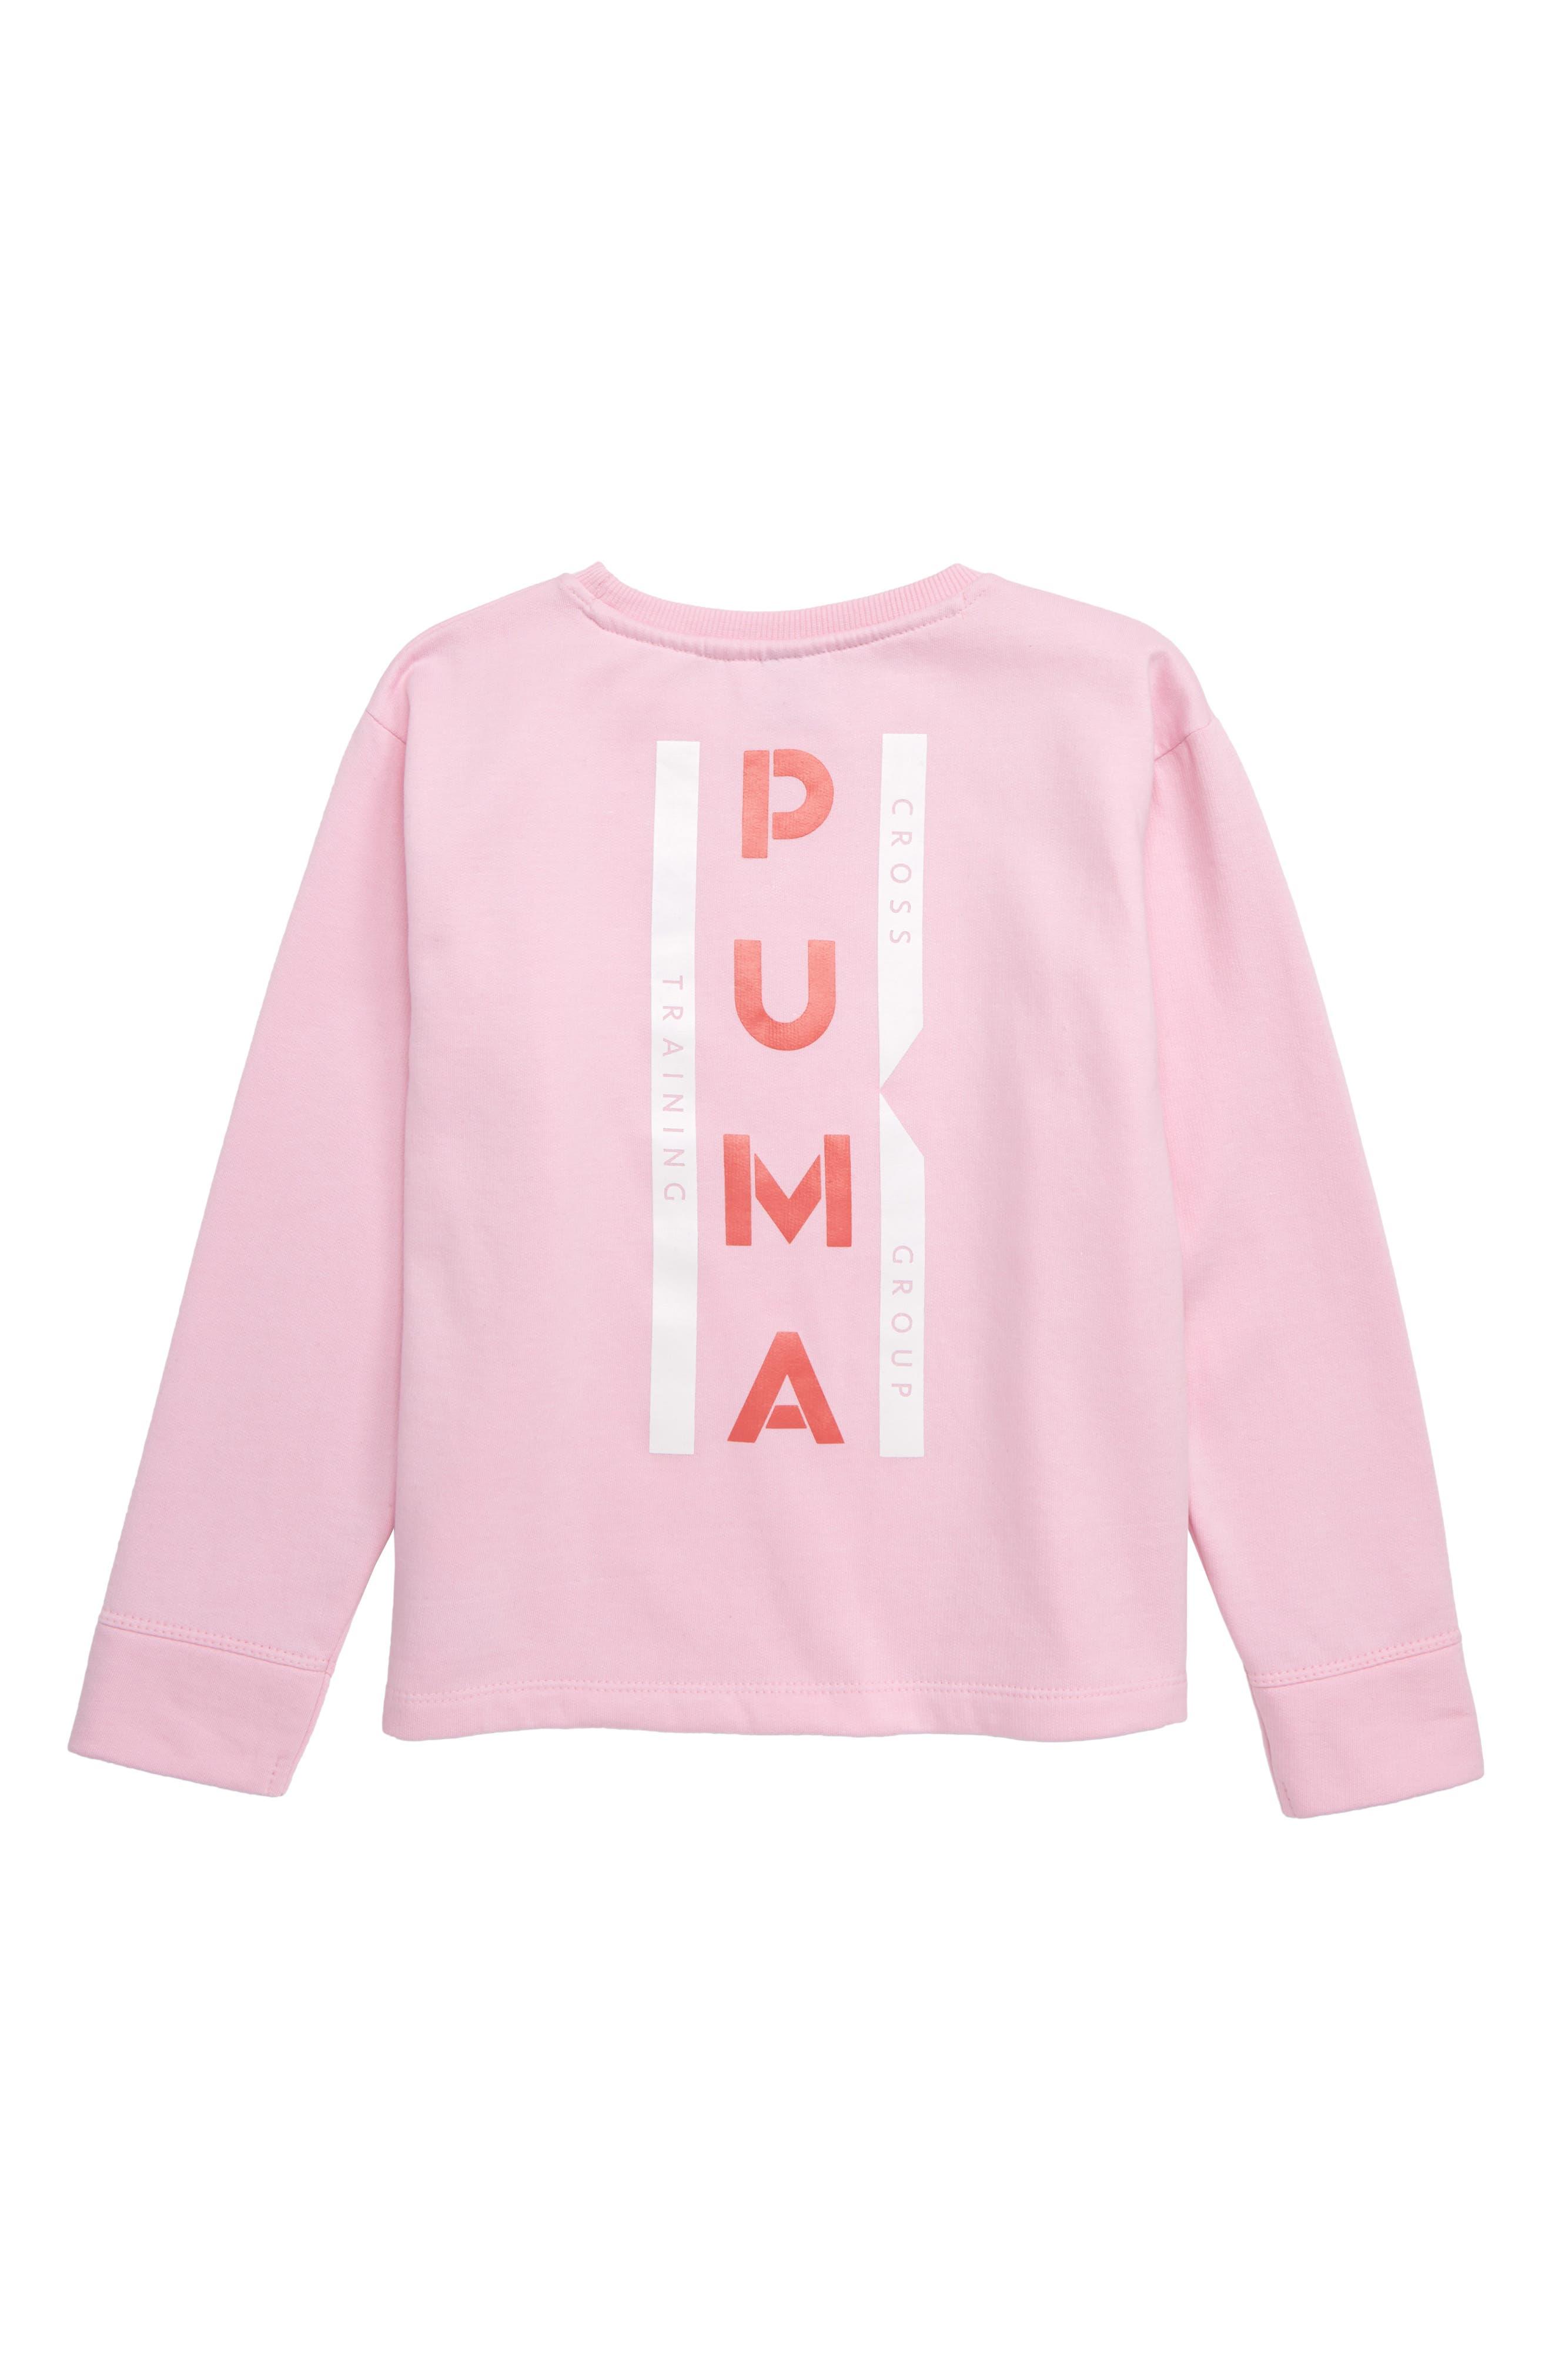 PUMA, Oversize Fleece Pullover, Alternate thumbnail 2, color, 650